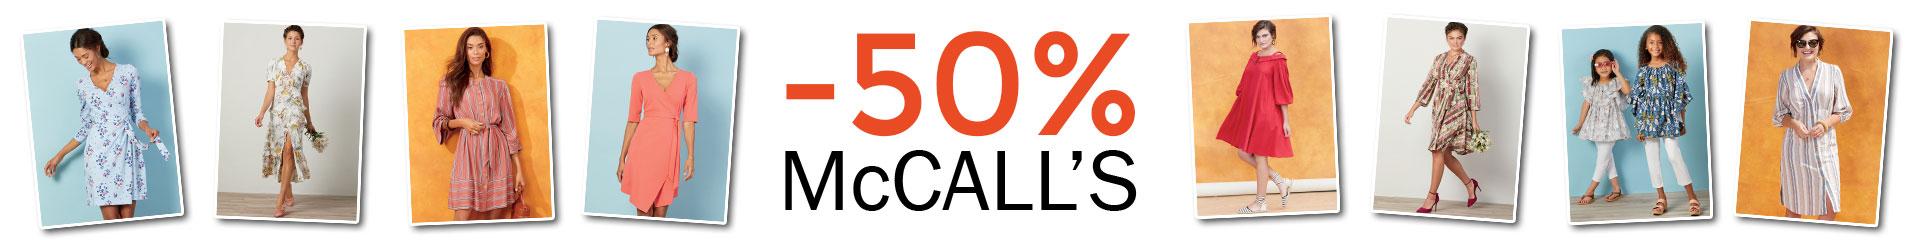 McCall's SALE